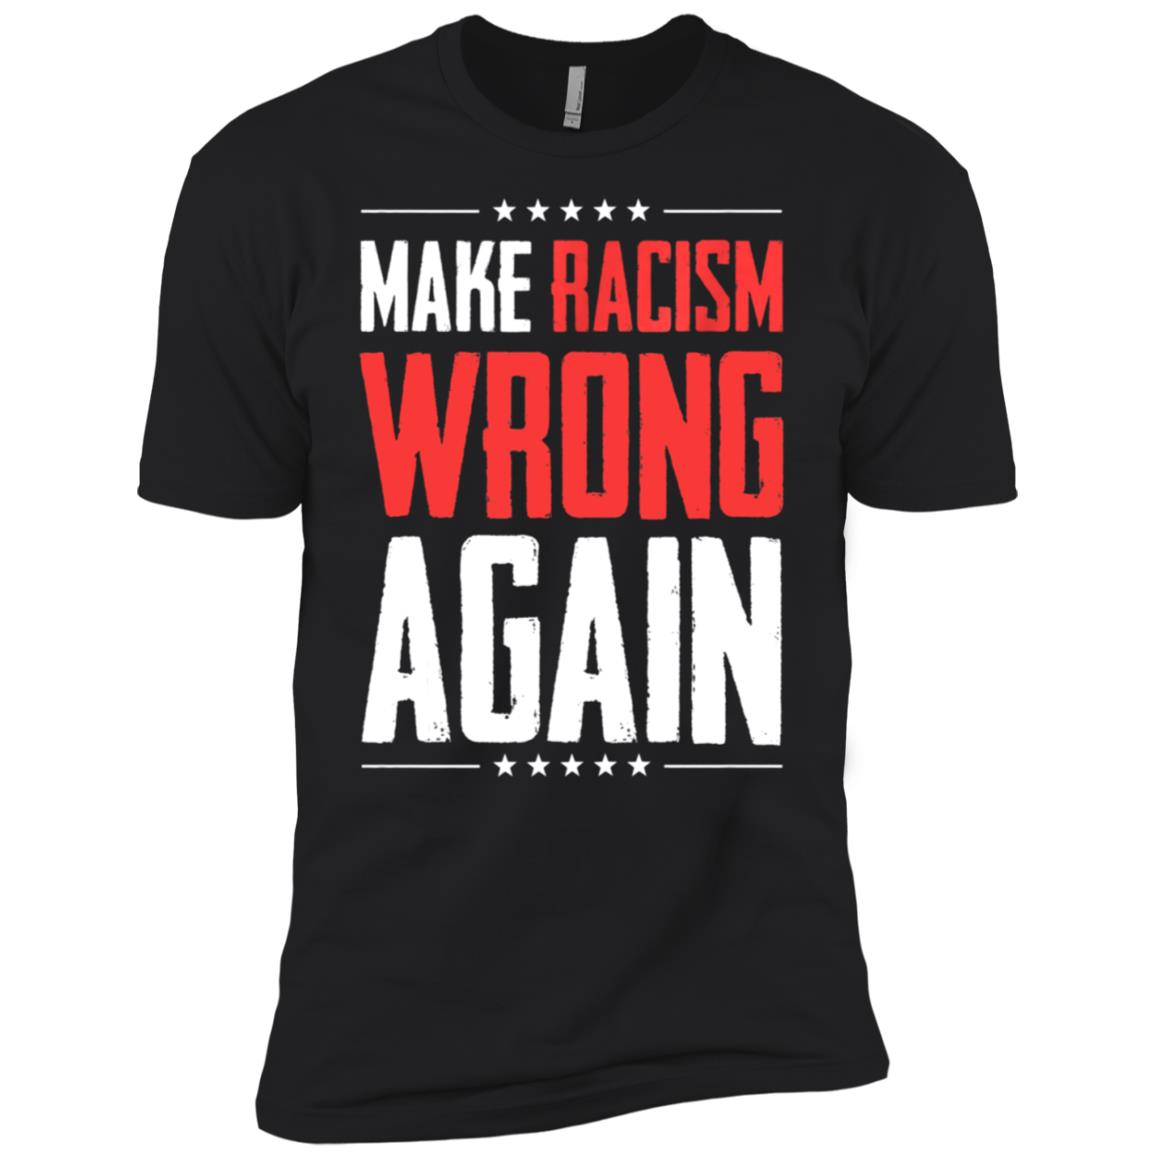 Make Racism Wrong Again – Unite Against Racism -6 Men Short Sleeve T-Shirt